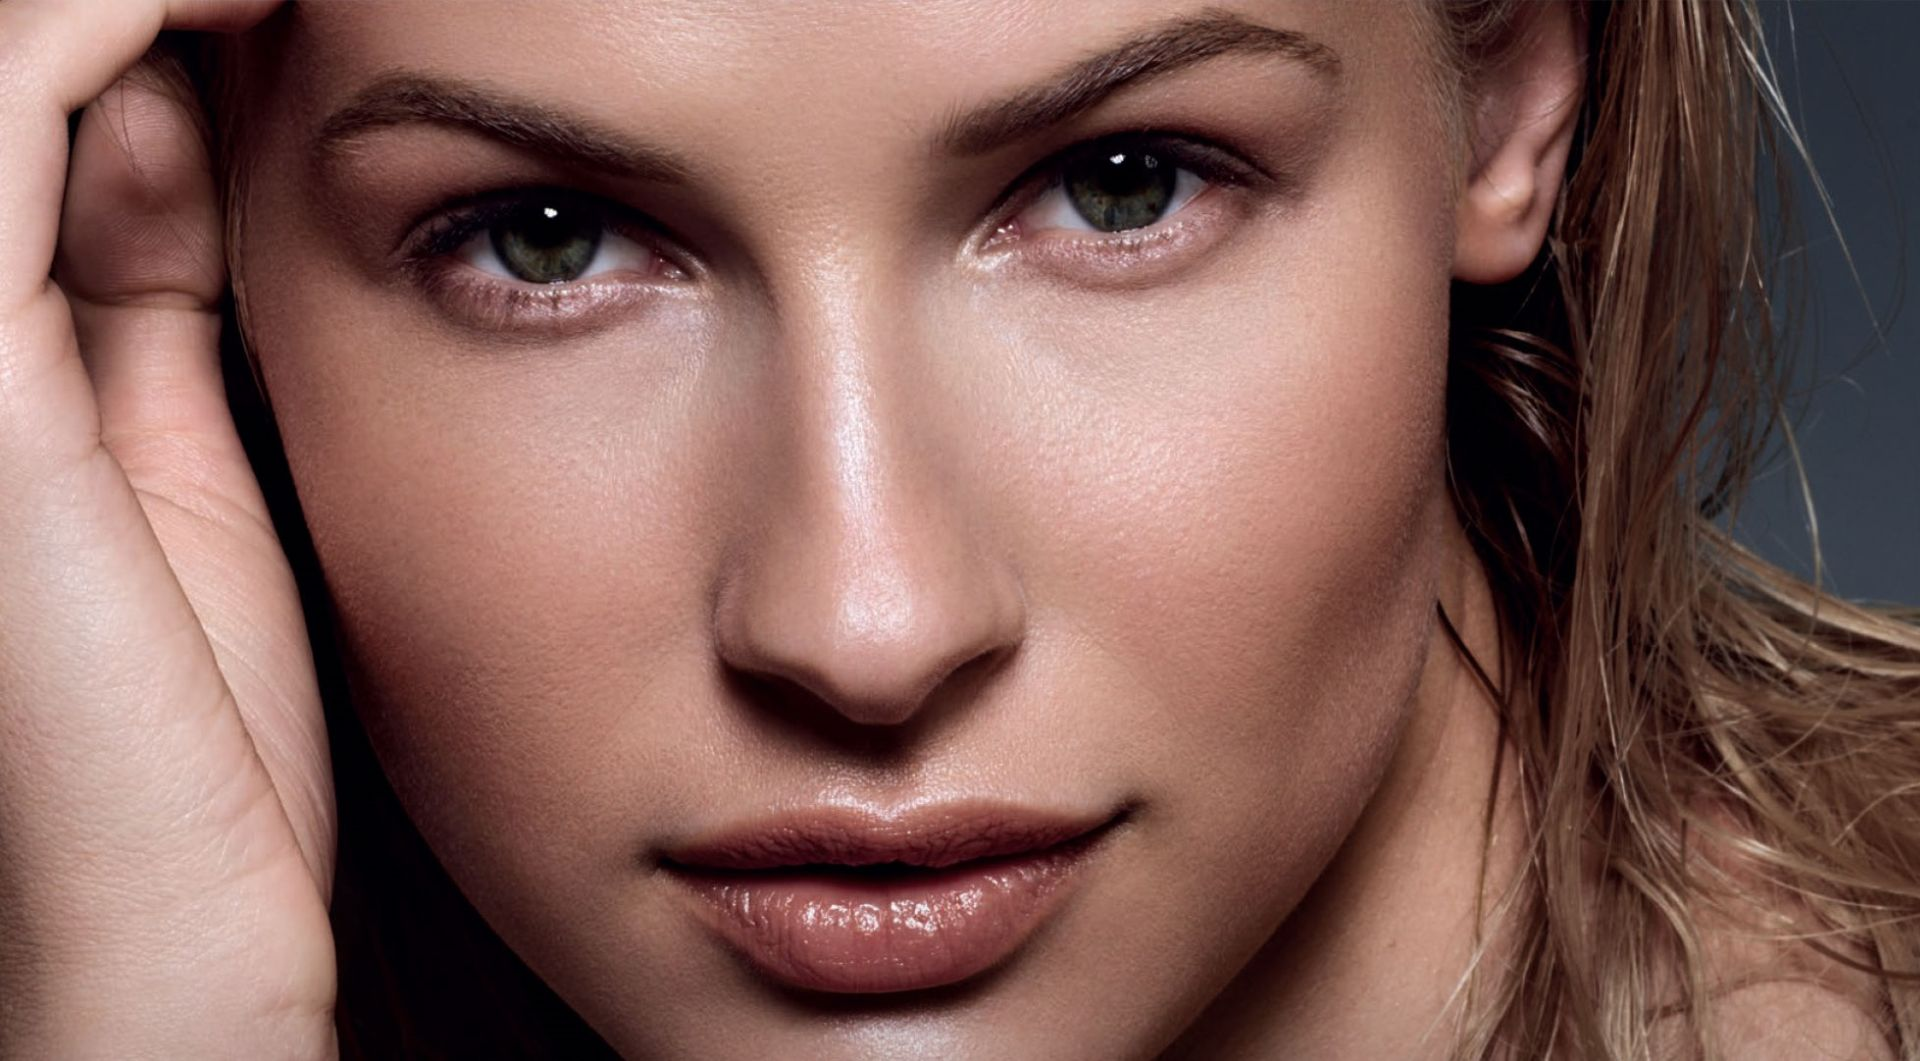 kozmetikus, kozmetikus Pécs, kozmetika, kozmetika Pécs, Babor kozmetika, Babor kozmetika Pécs, pécsi kozmetikus, pécsi kozmetika